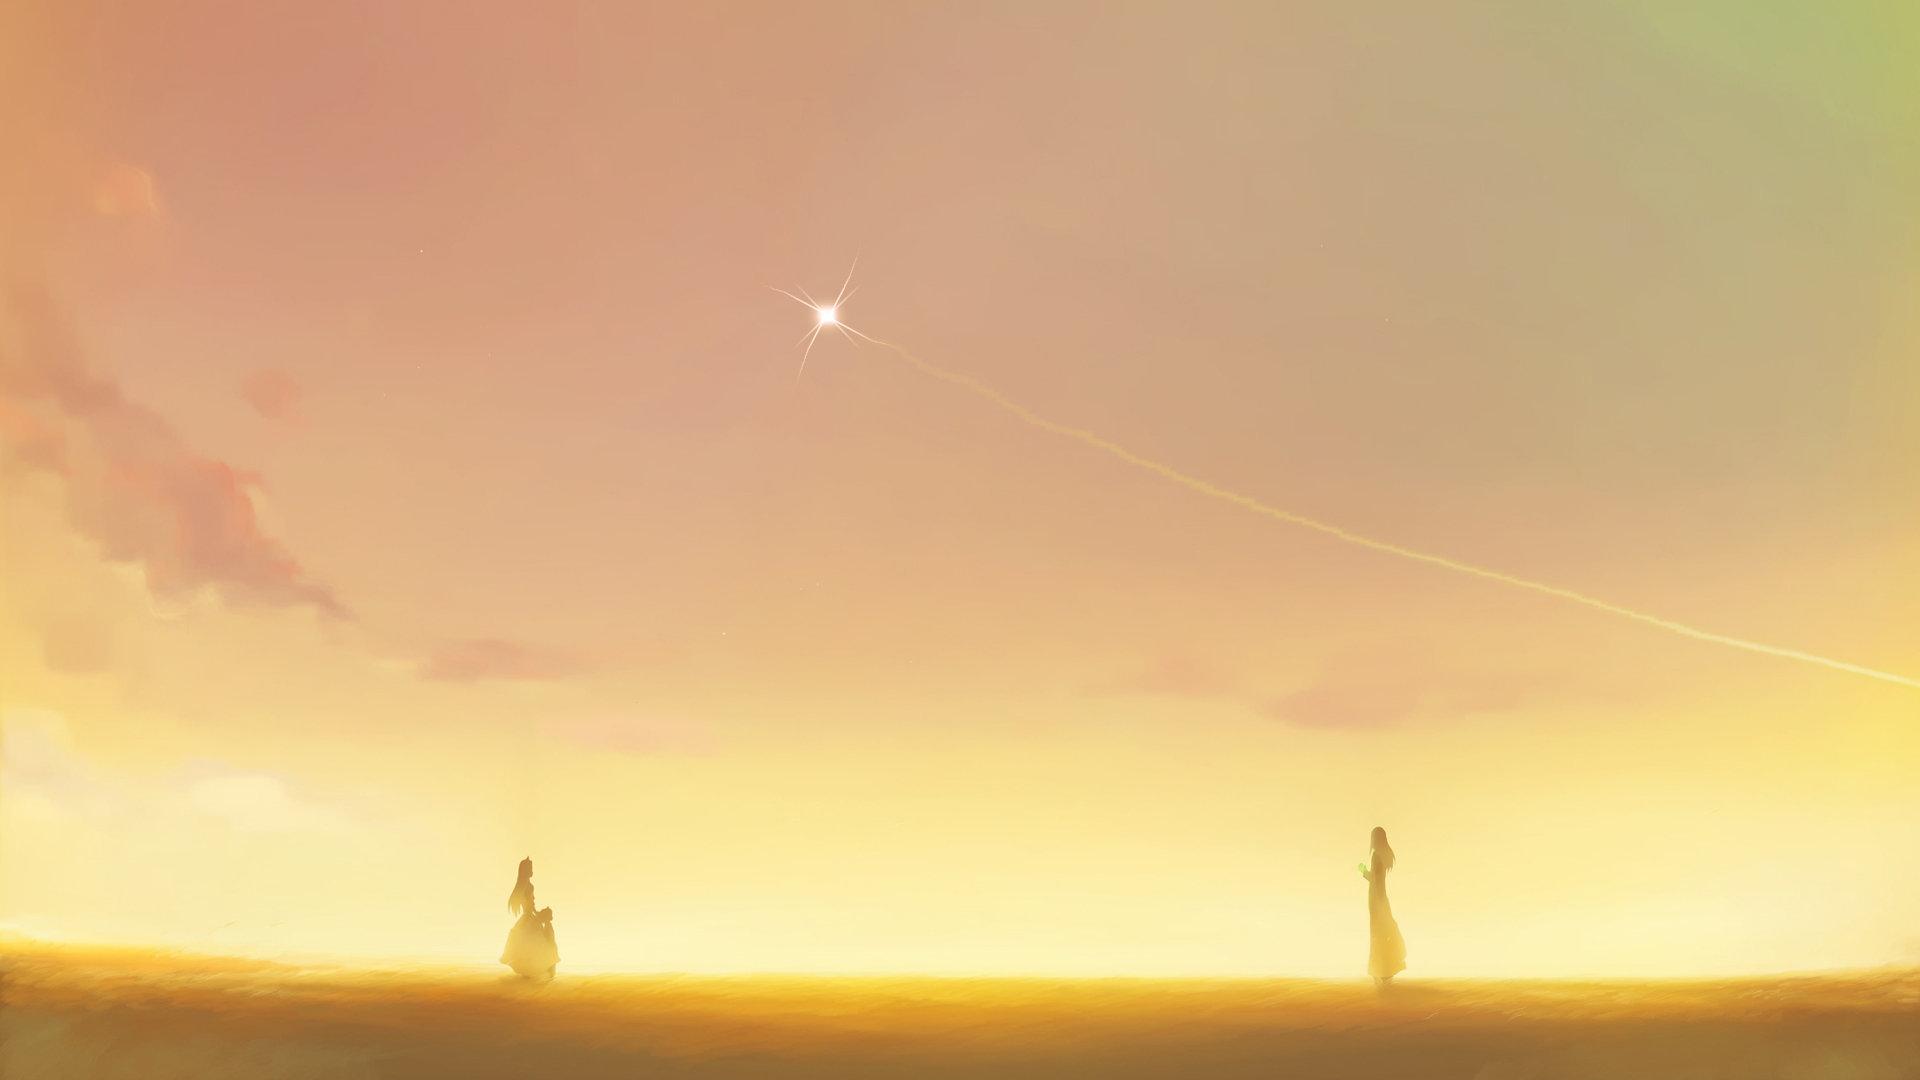 Free download Scenery anime wallpaper ...